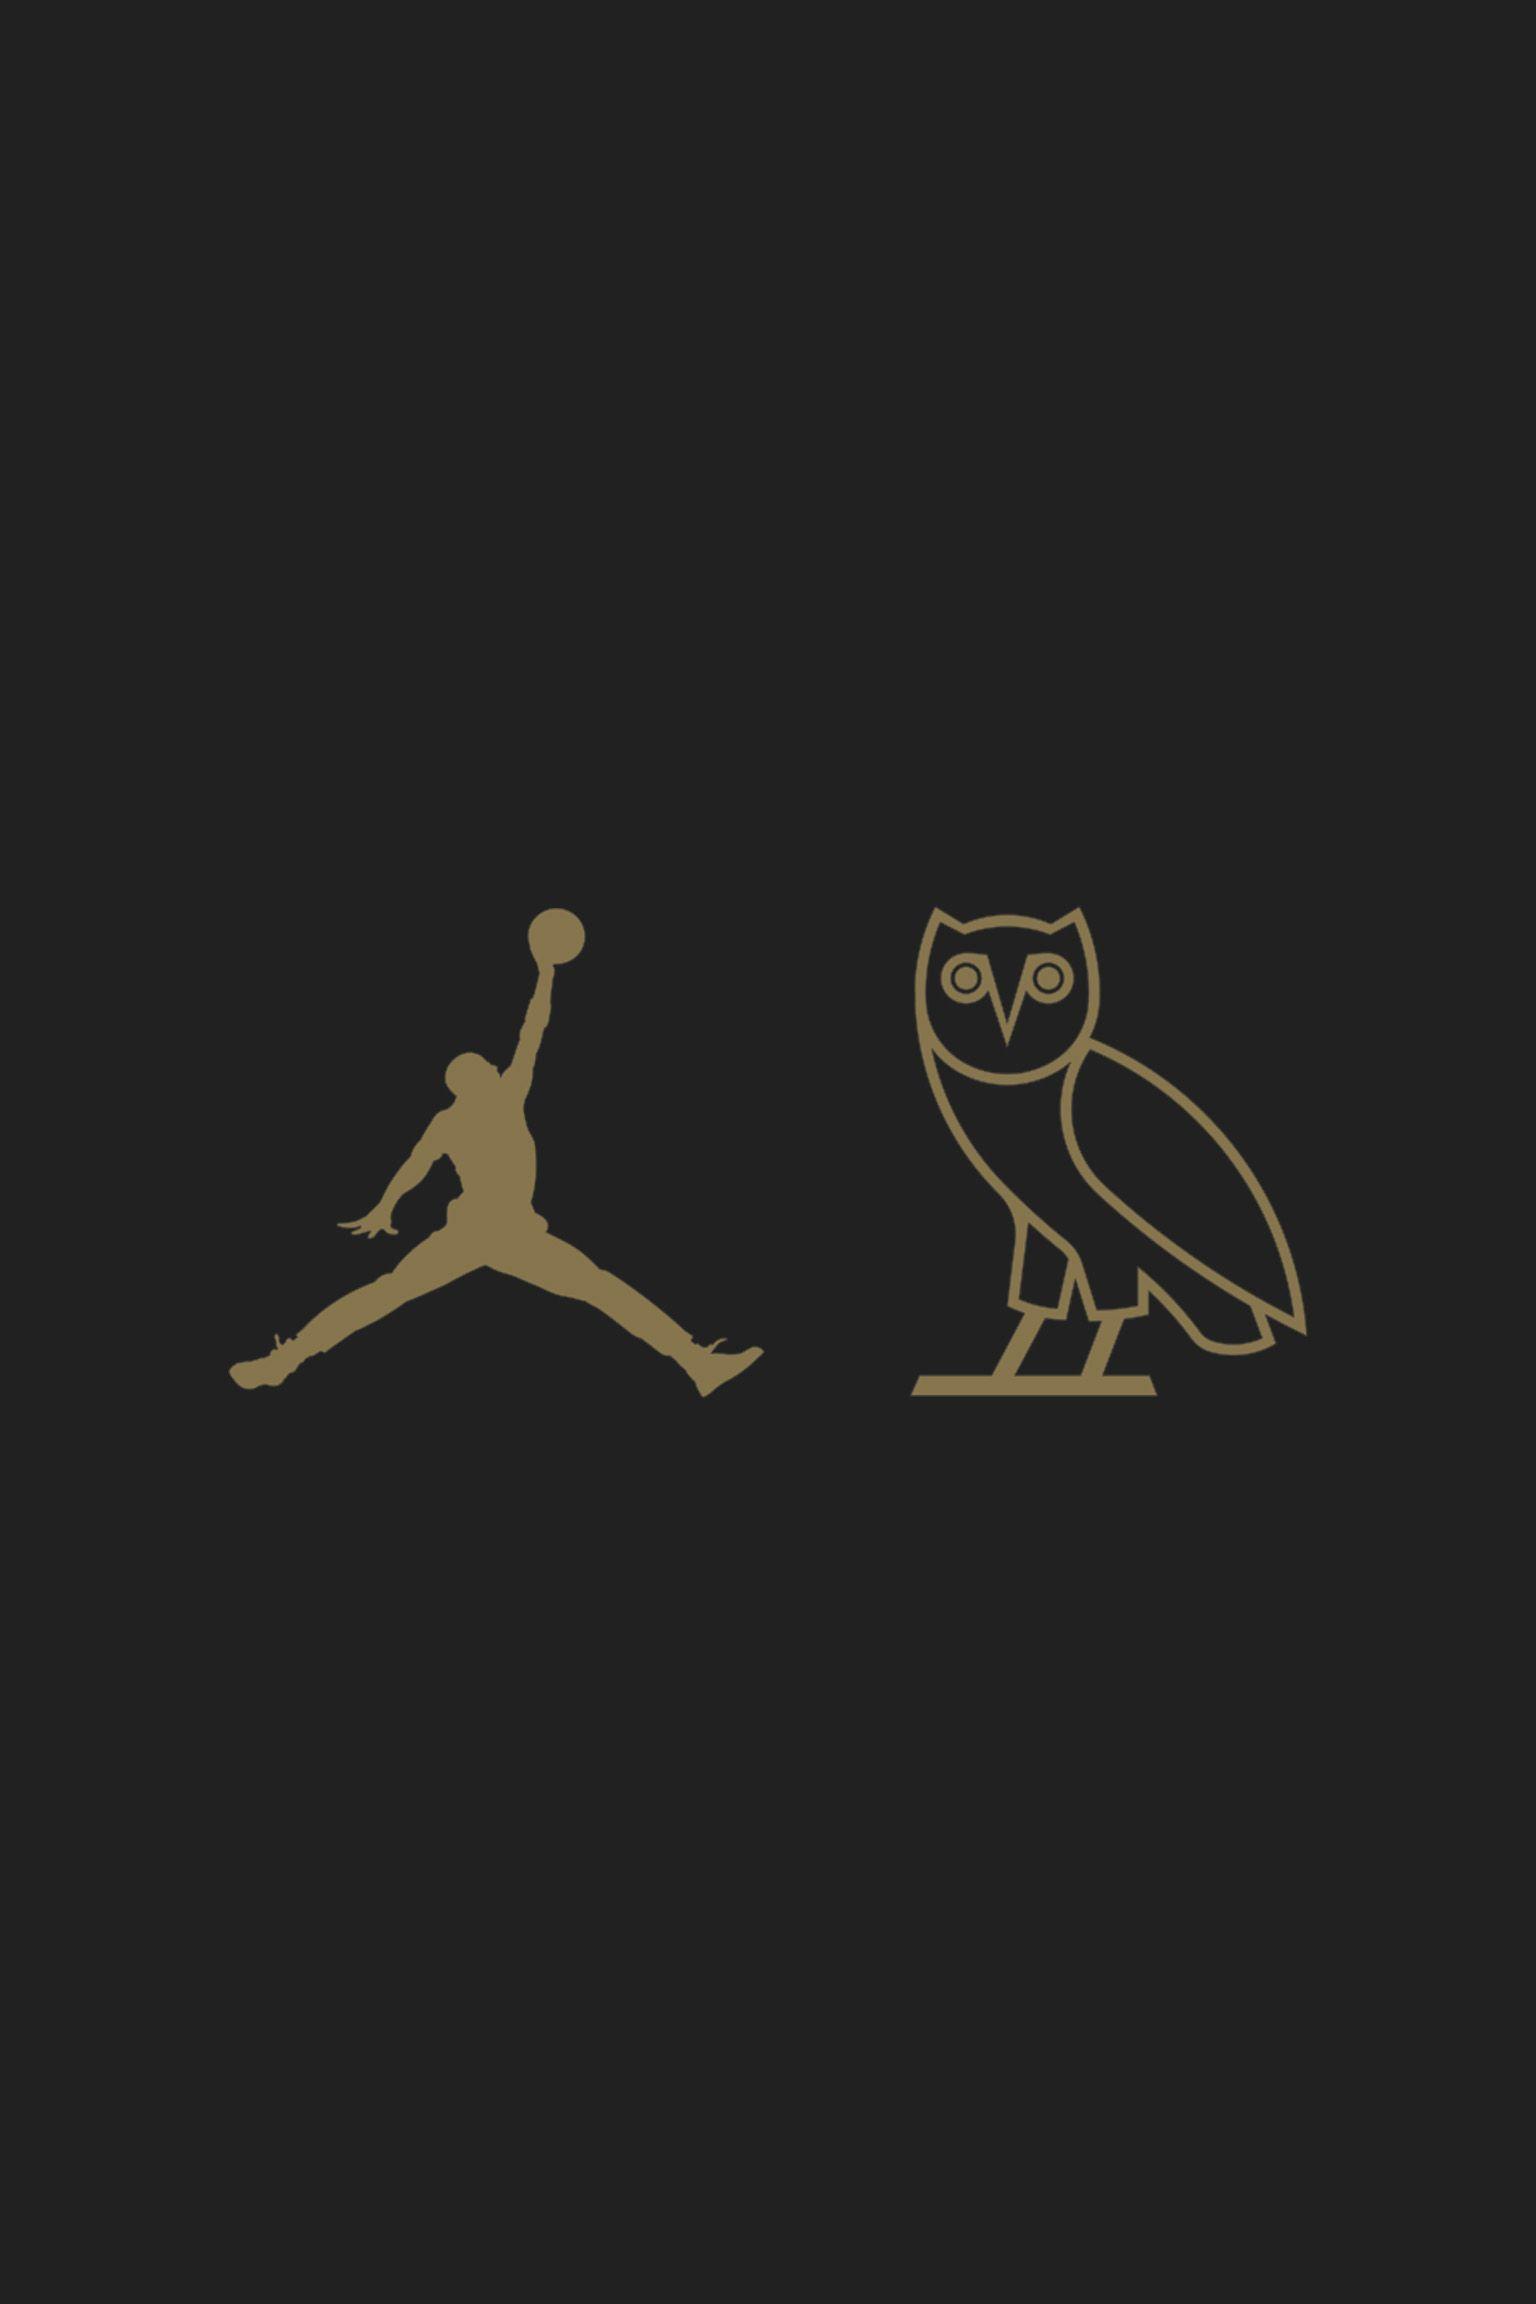 Air Jordan 10 Retro 'OVO' 'Black' Release Date